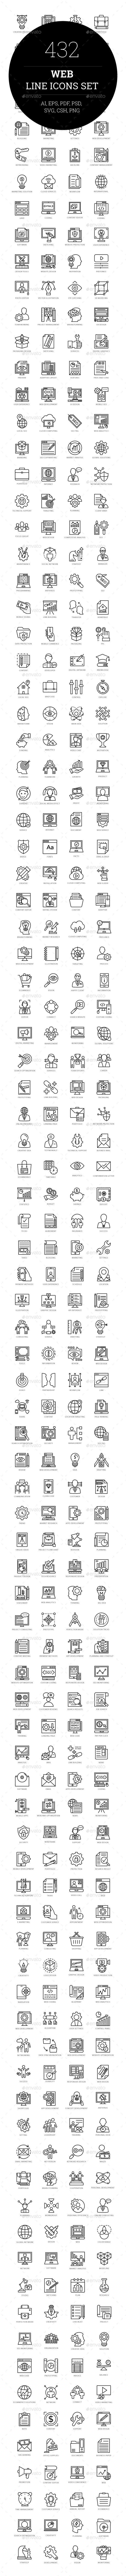 432 Web Line Icons - Icons